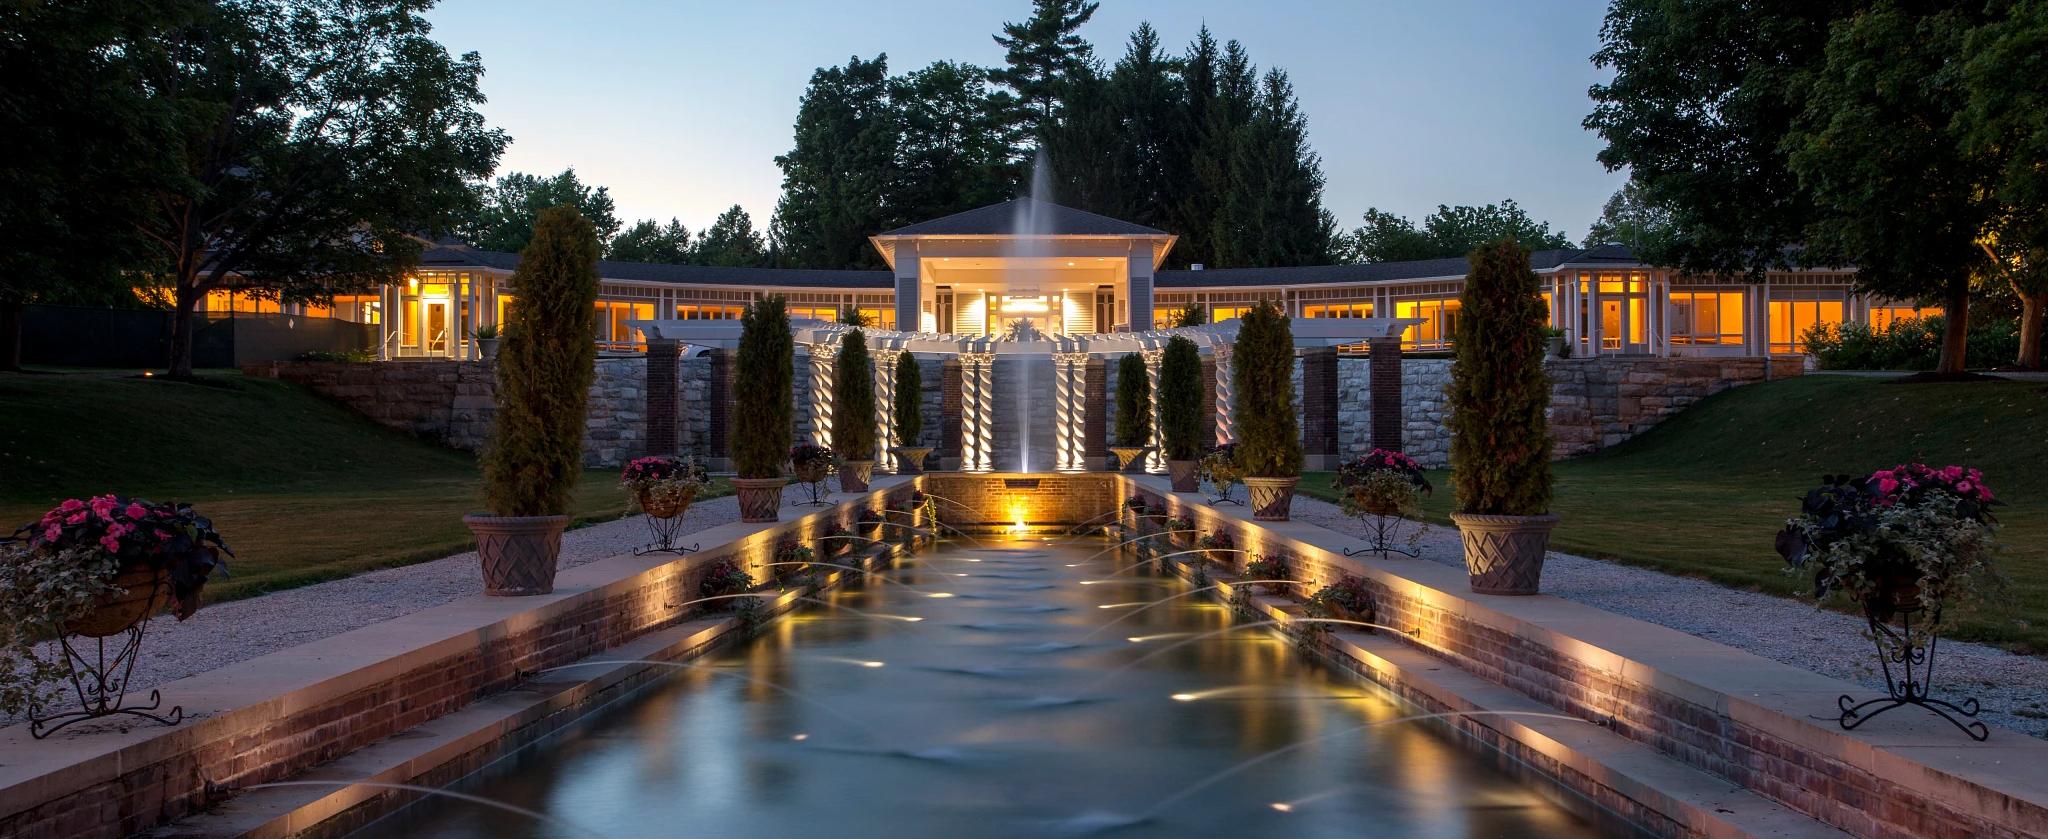 Canyon Ranch Wellness Resort Lenox, Massachusetts